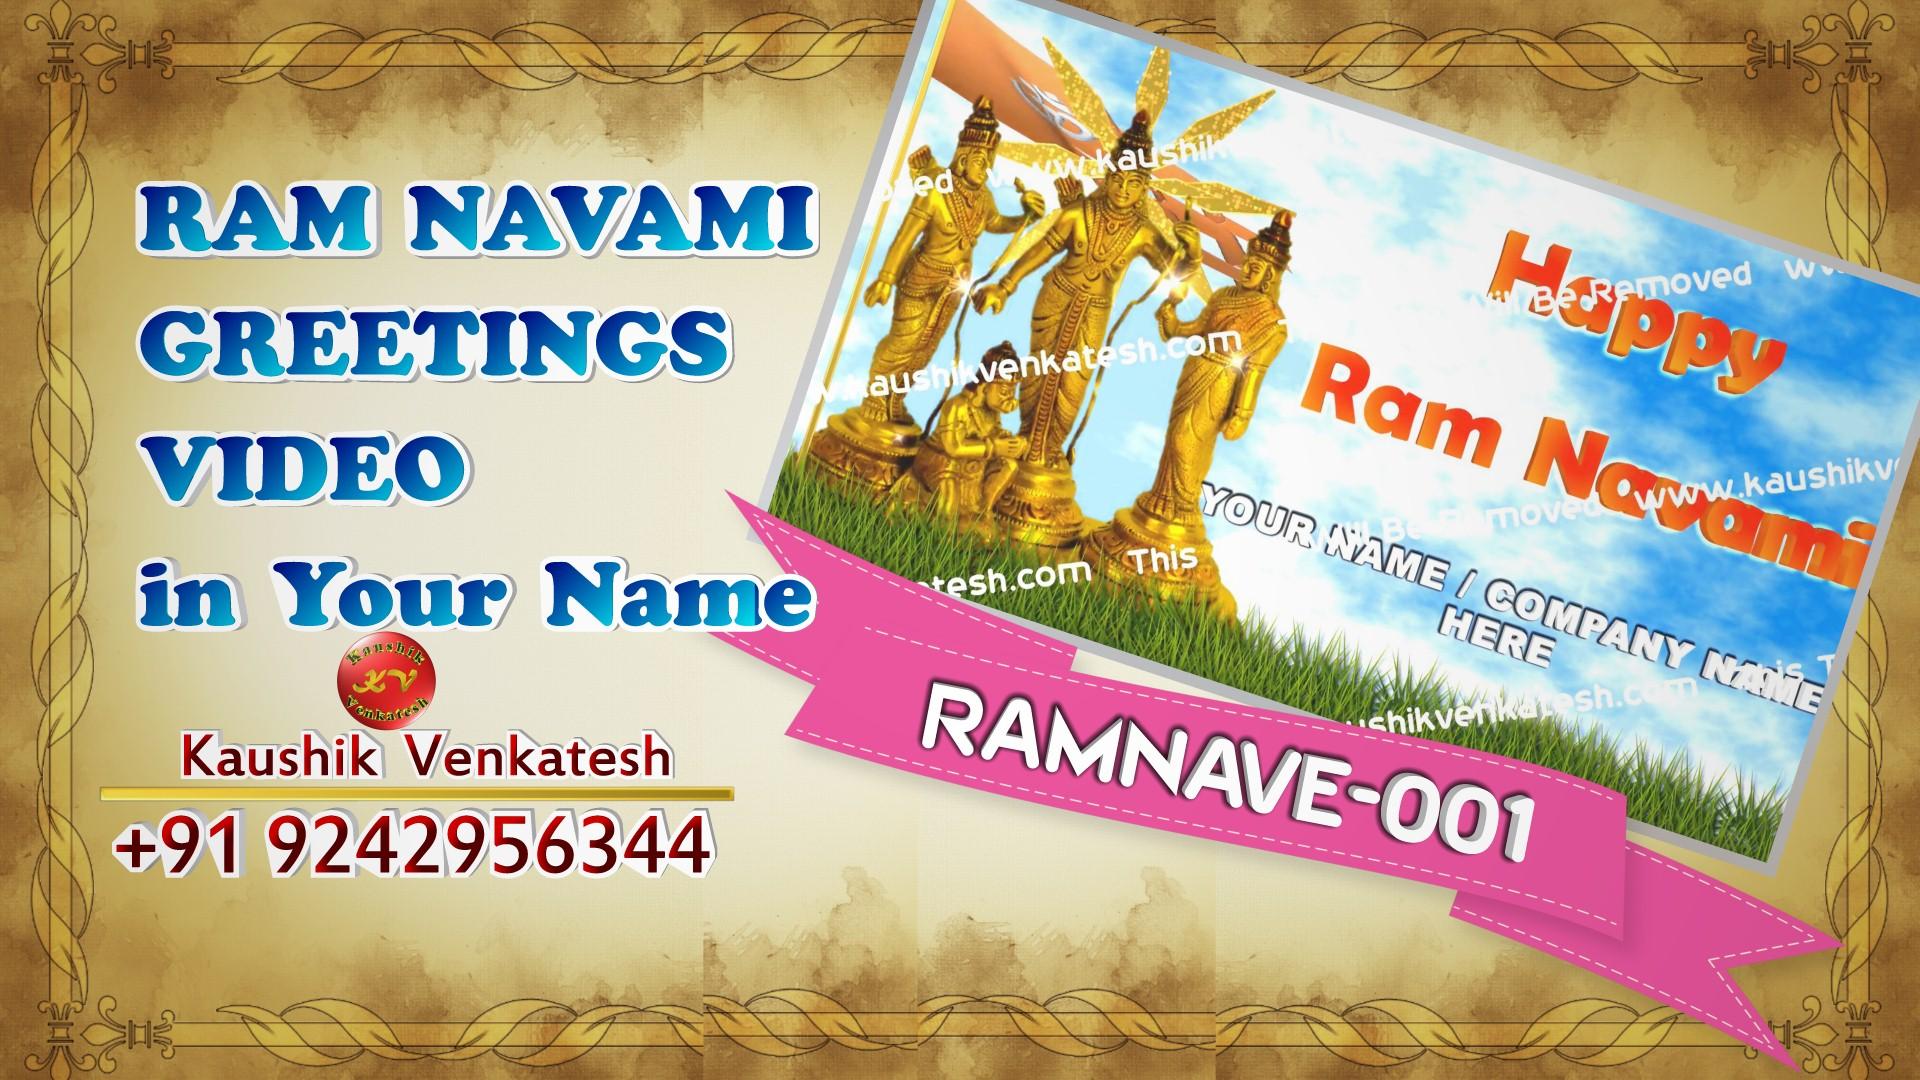 Personalized Video Greetings for Hindu Festival Ram Navami.